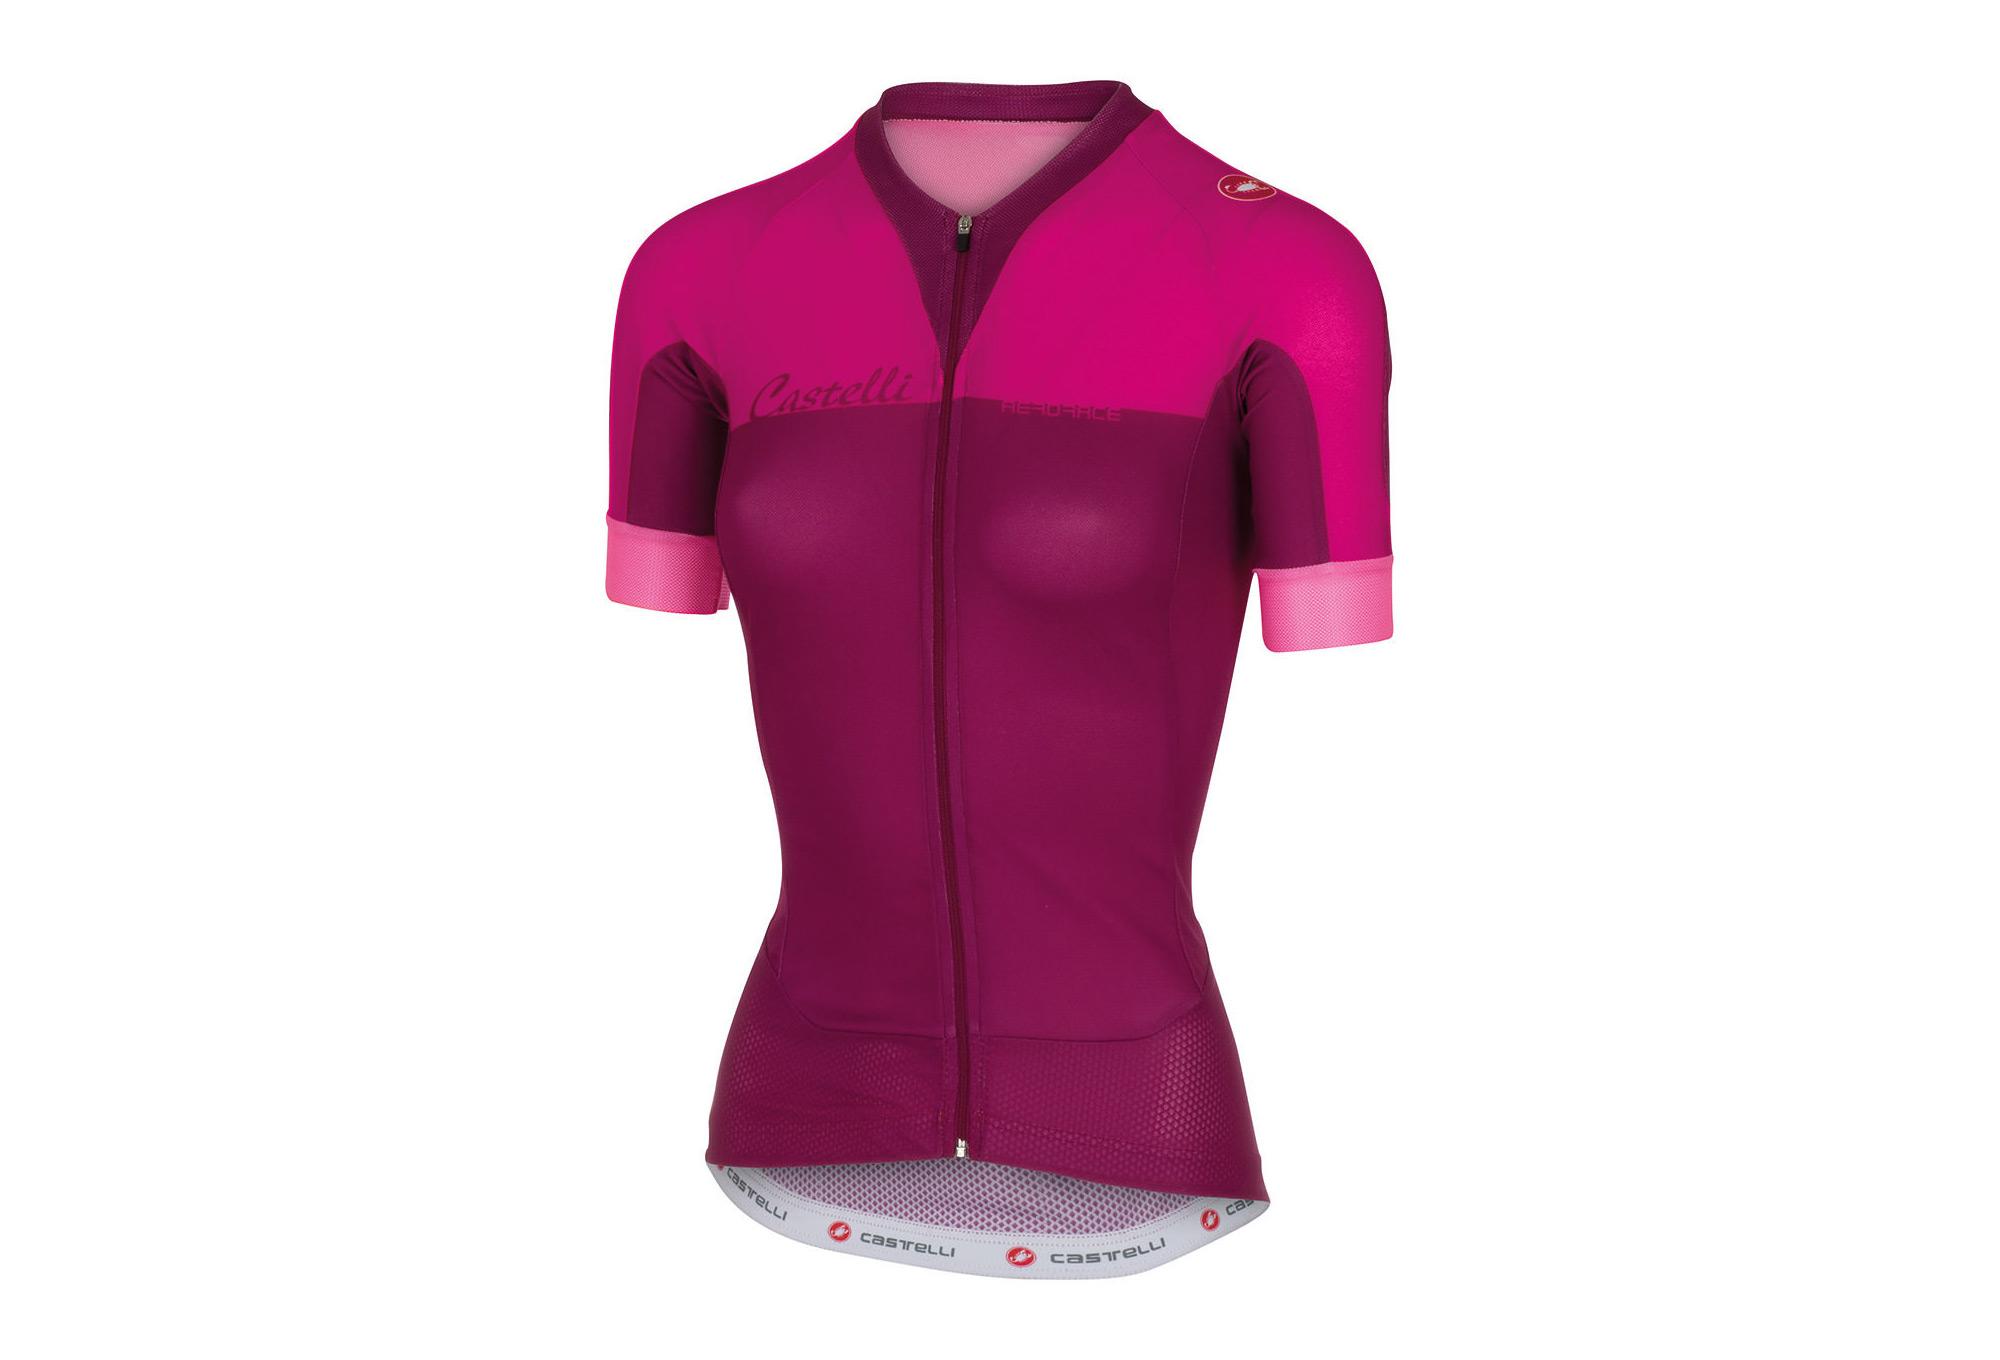 aeacfbc2d CASTELLI AERO RACE Woman Short Sleeves Jersey Pink